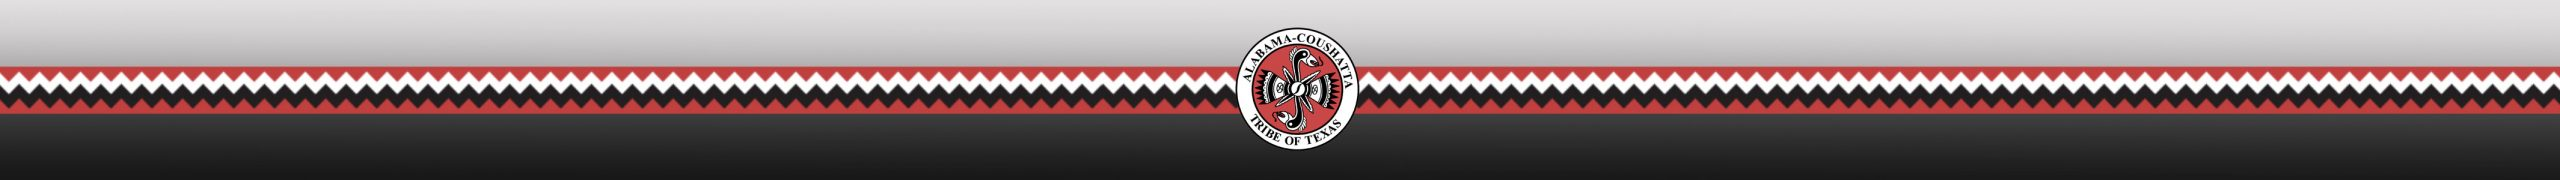 Alabama Coushatta Tribe of Texas Banner